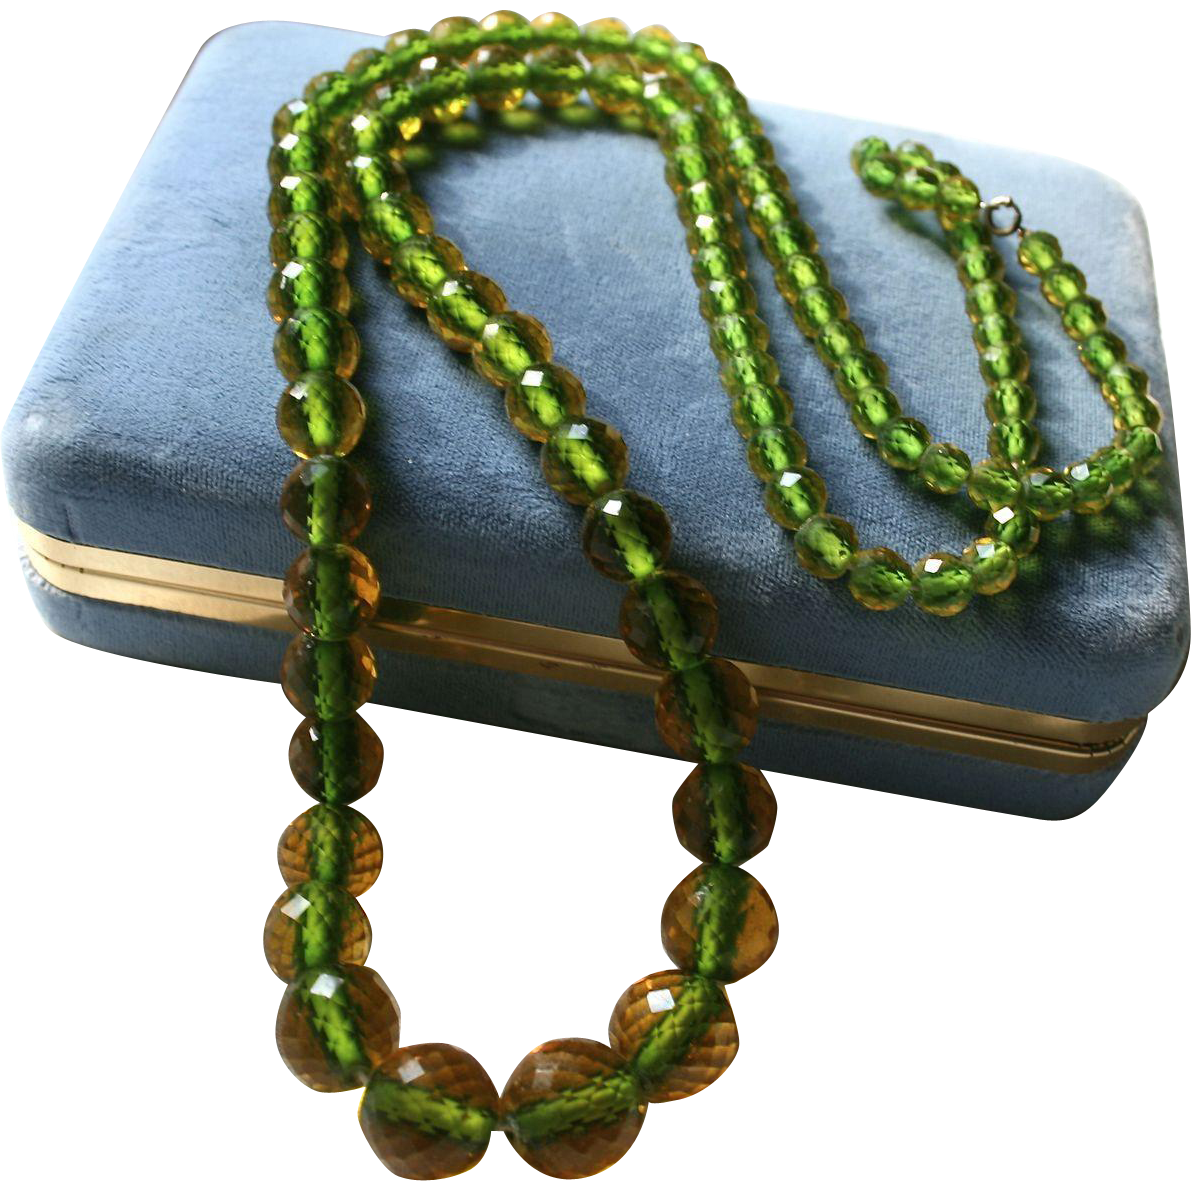 Rare Art Deco Era Cut Faceted Crystal Bi Color Beaded Necklace From Randomharvest On Ruby Lane